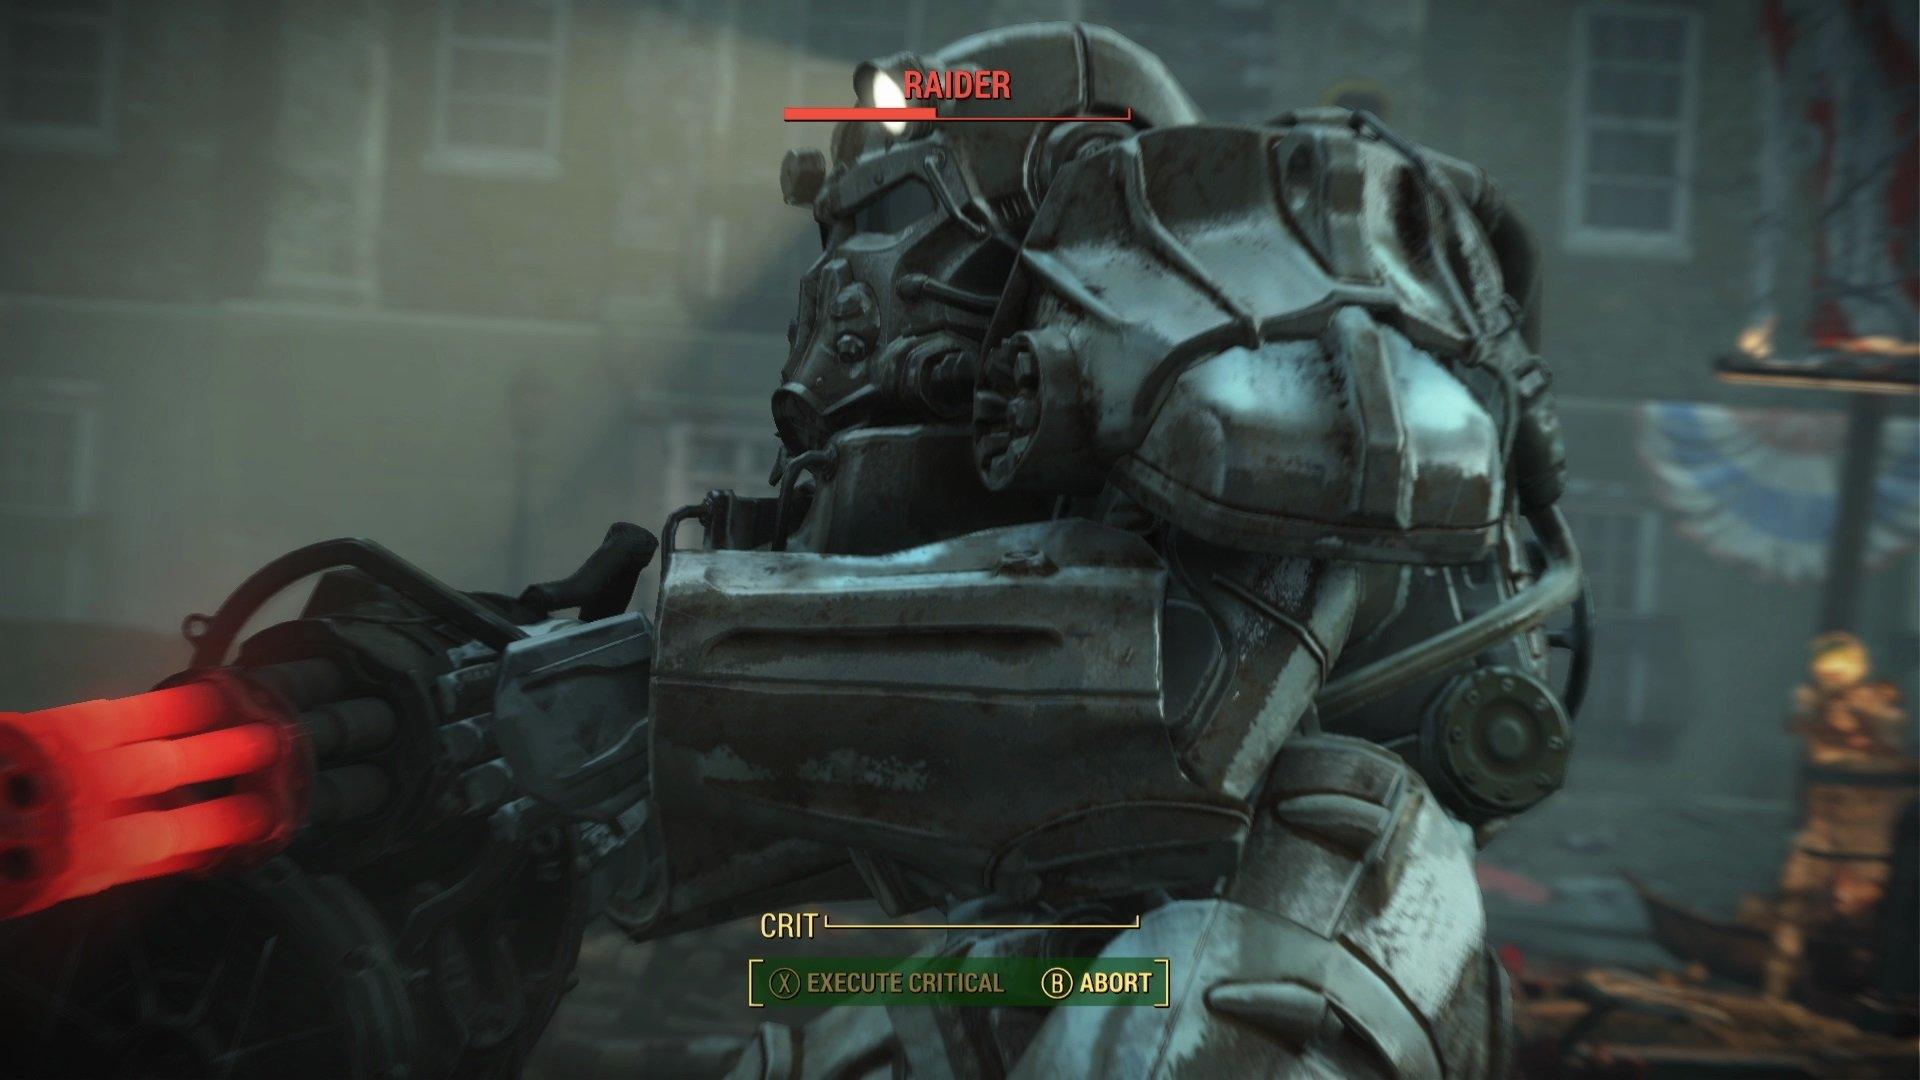 Fallout 4 Ultimate Vault Dweller's Survival Guide Bundle Comes With Fallout 4 Calendar 2019